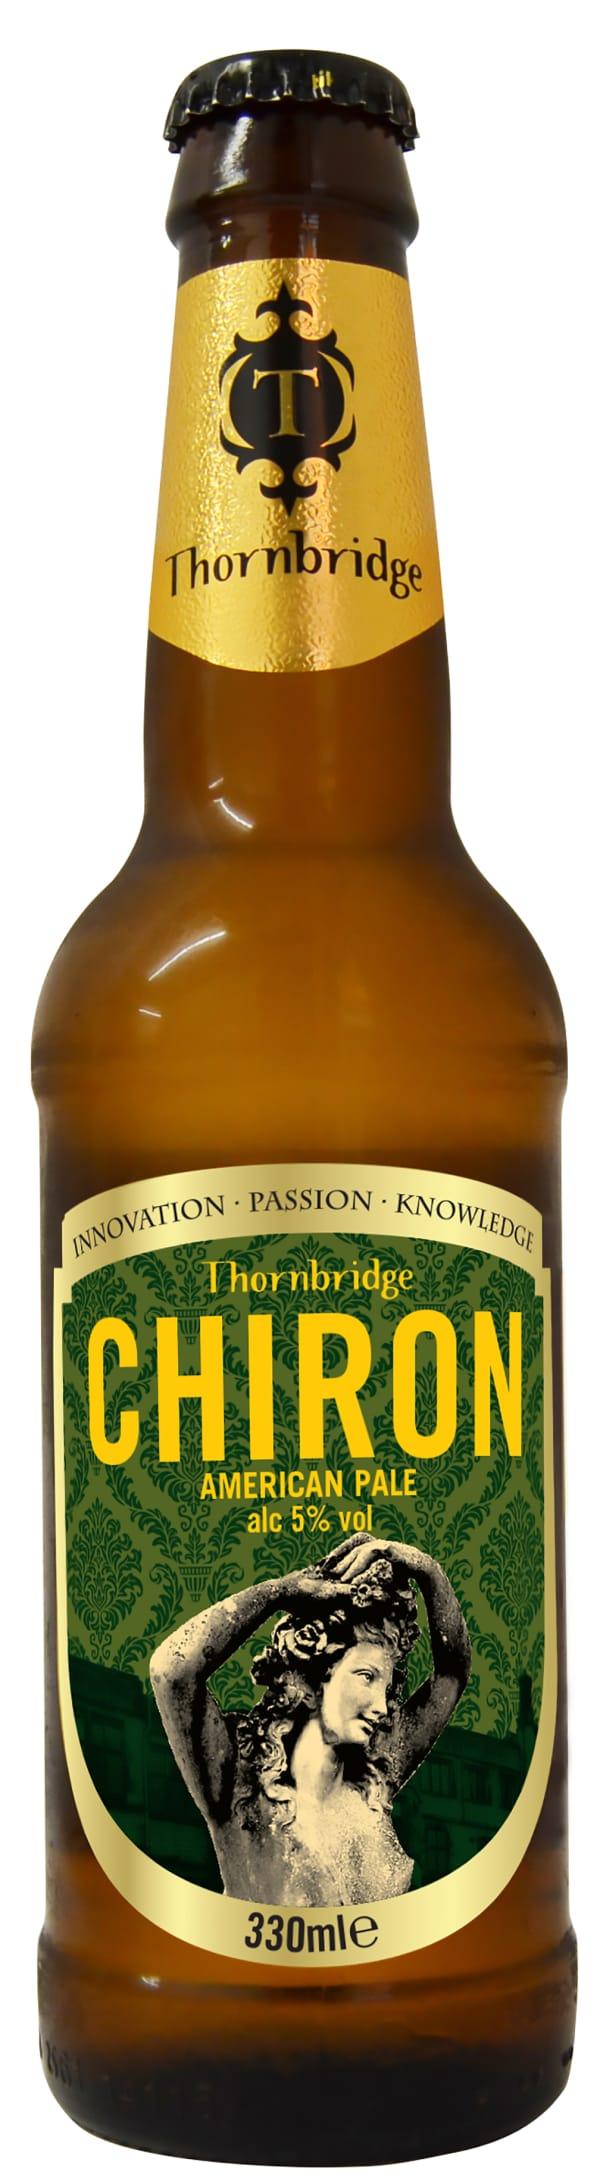 Thornbridge Chiron American Pale